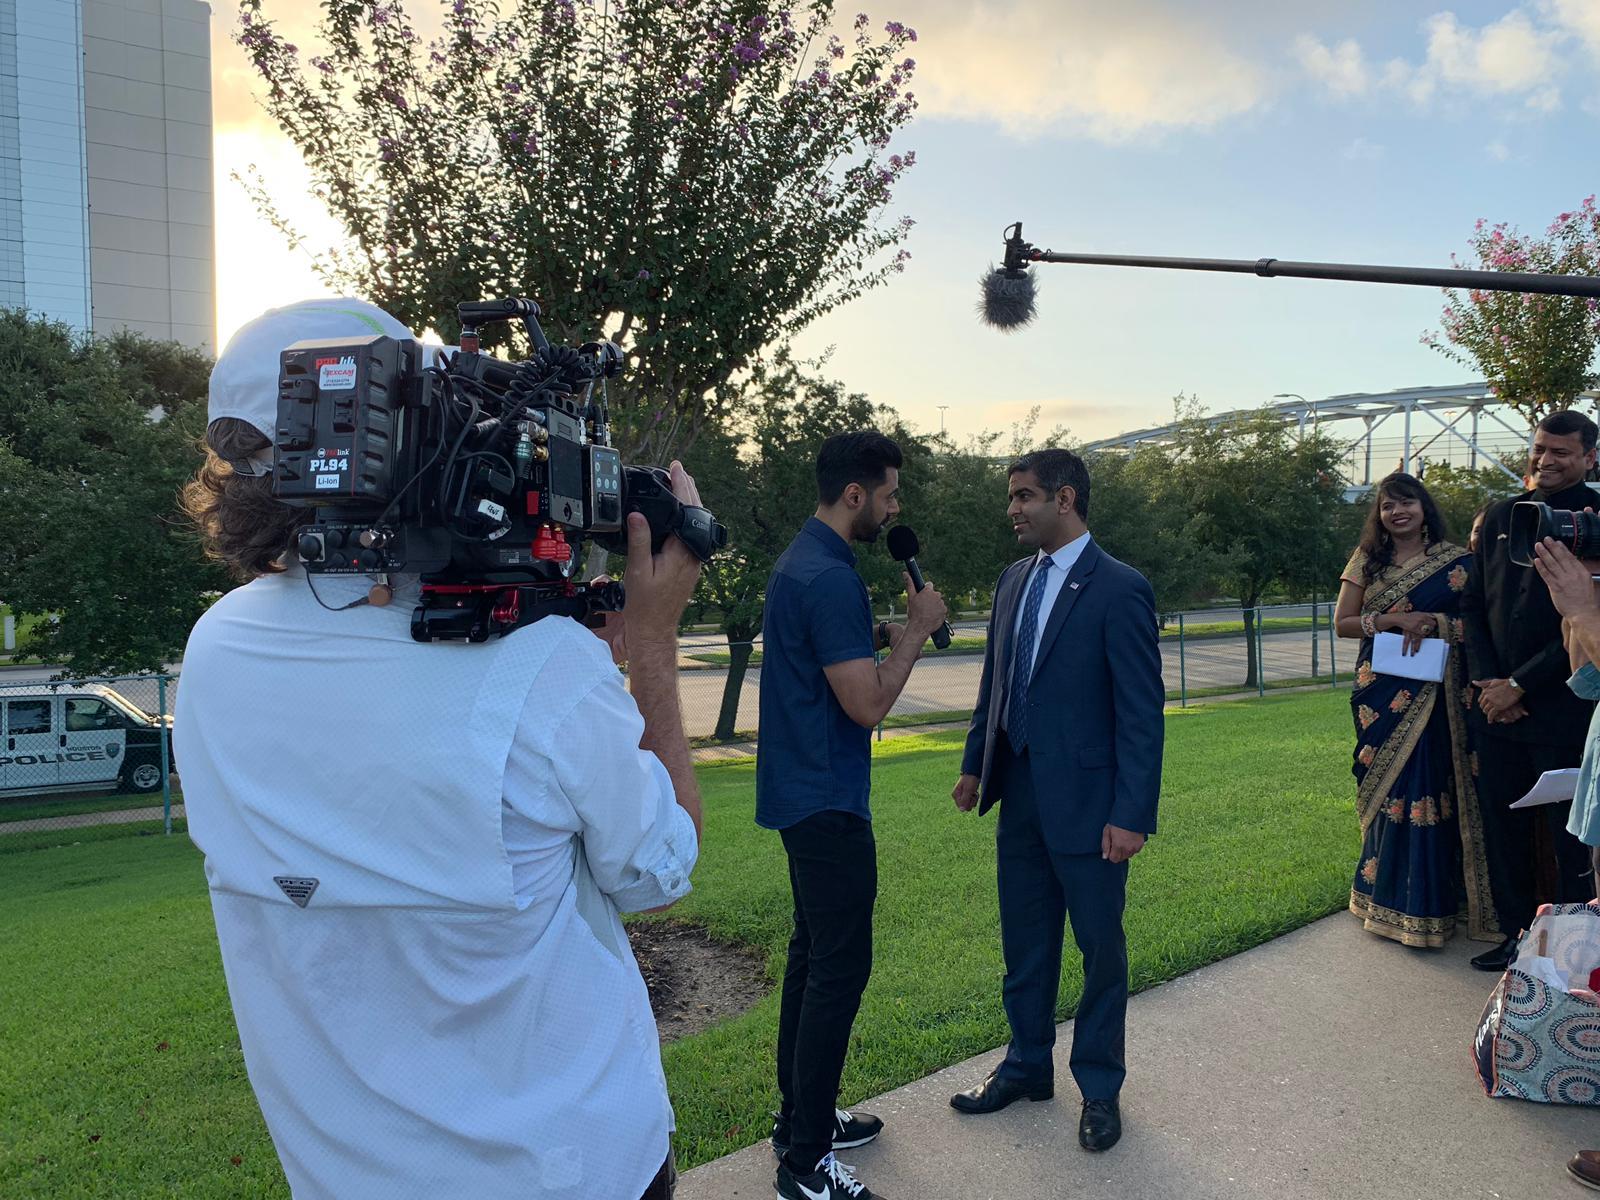 Netflix star Hasan Minhaj interviews Hirsh Singh